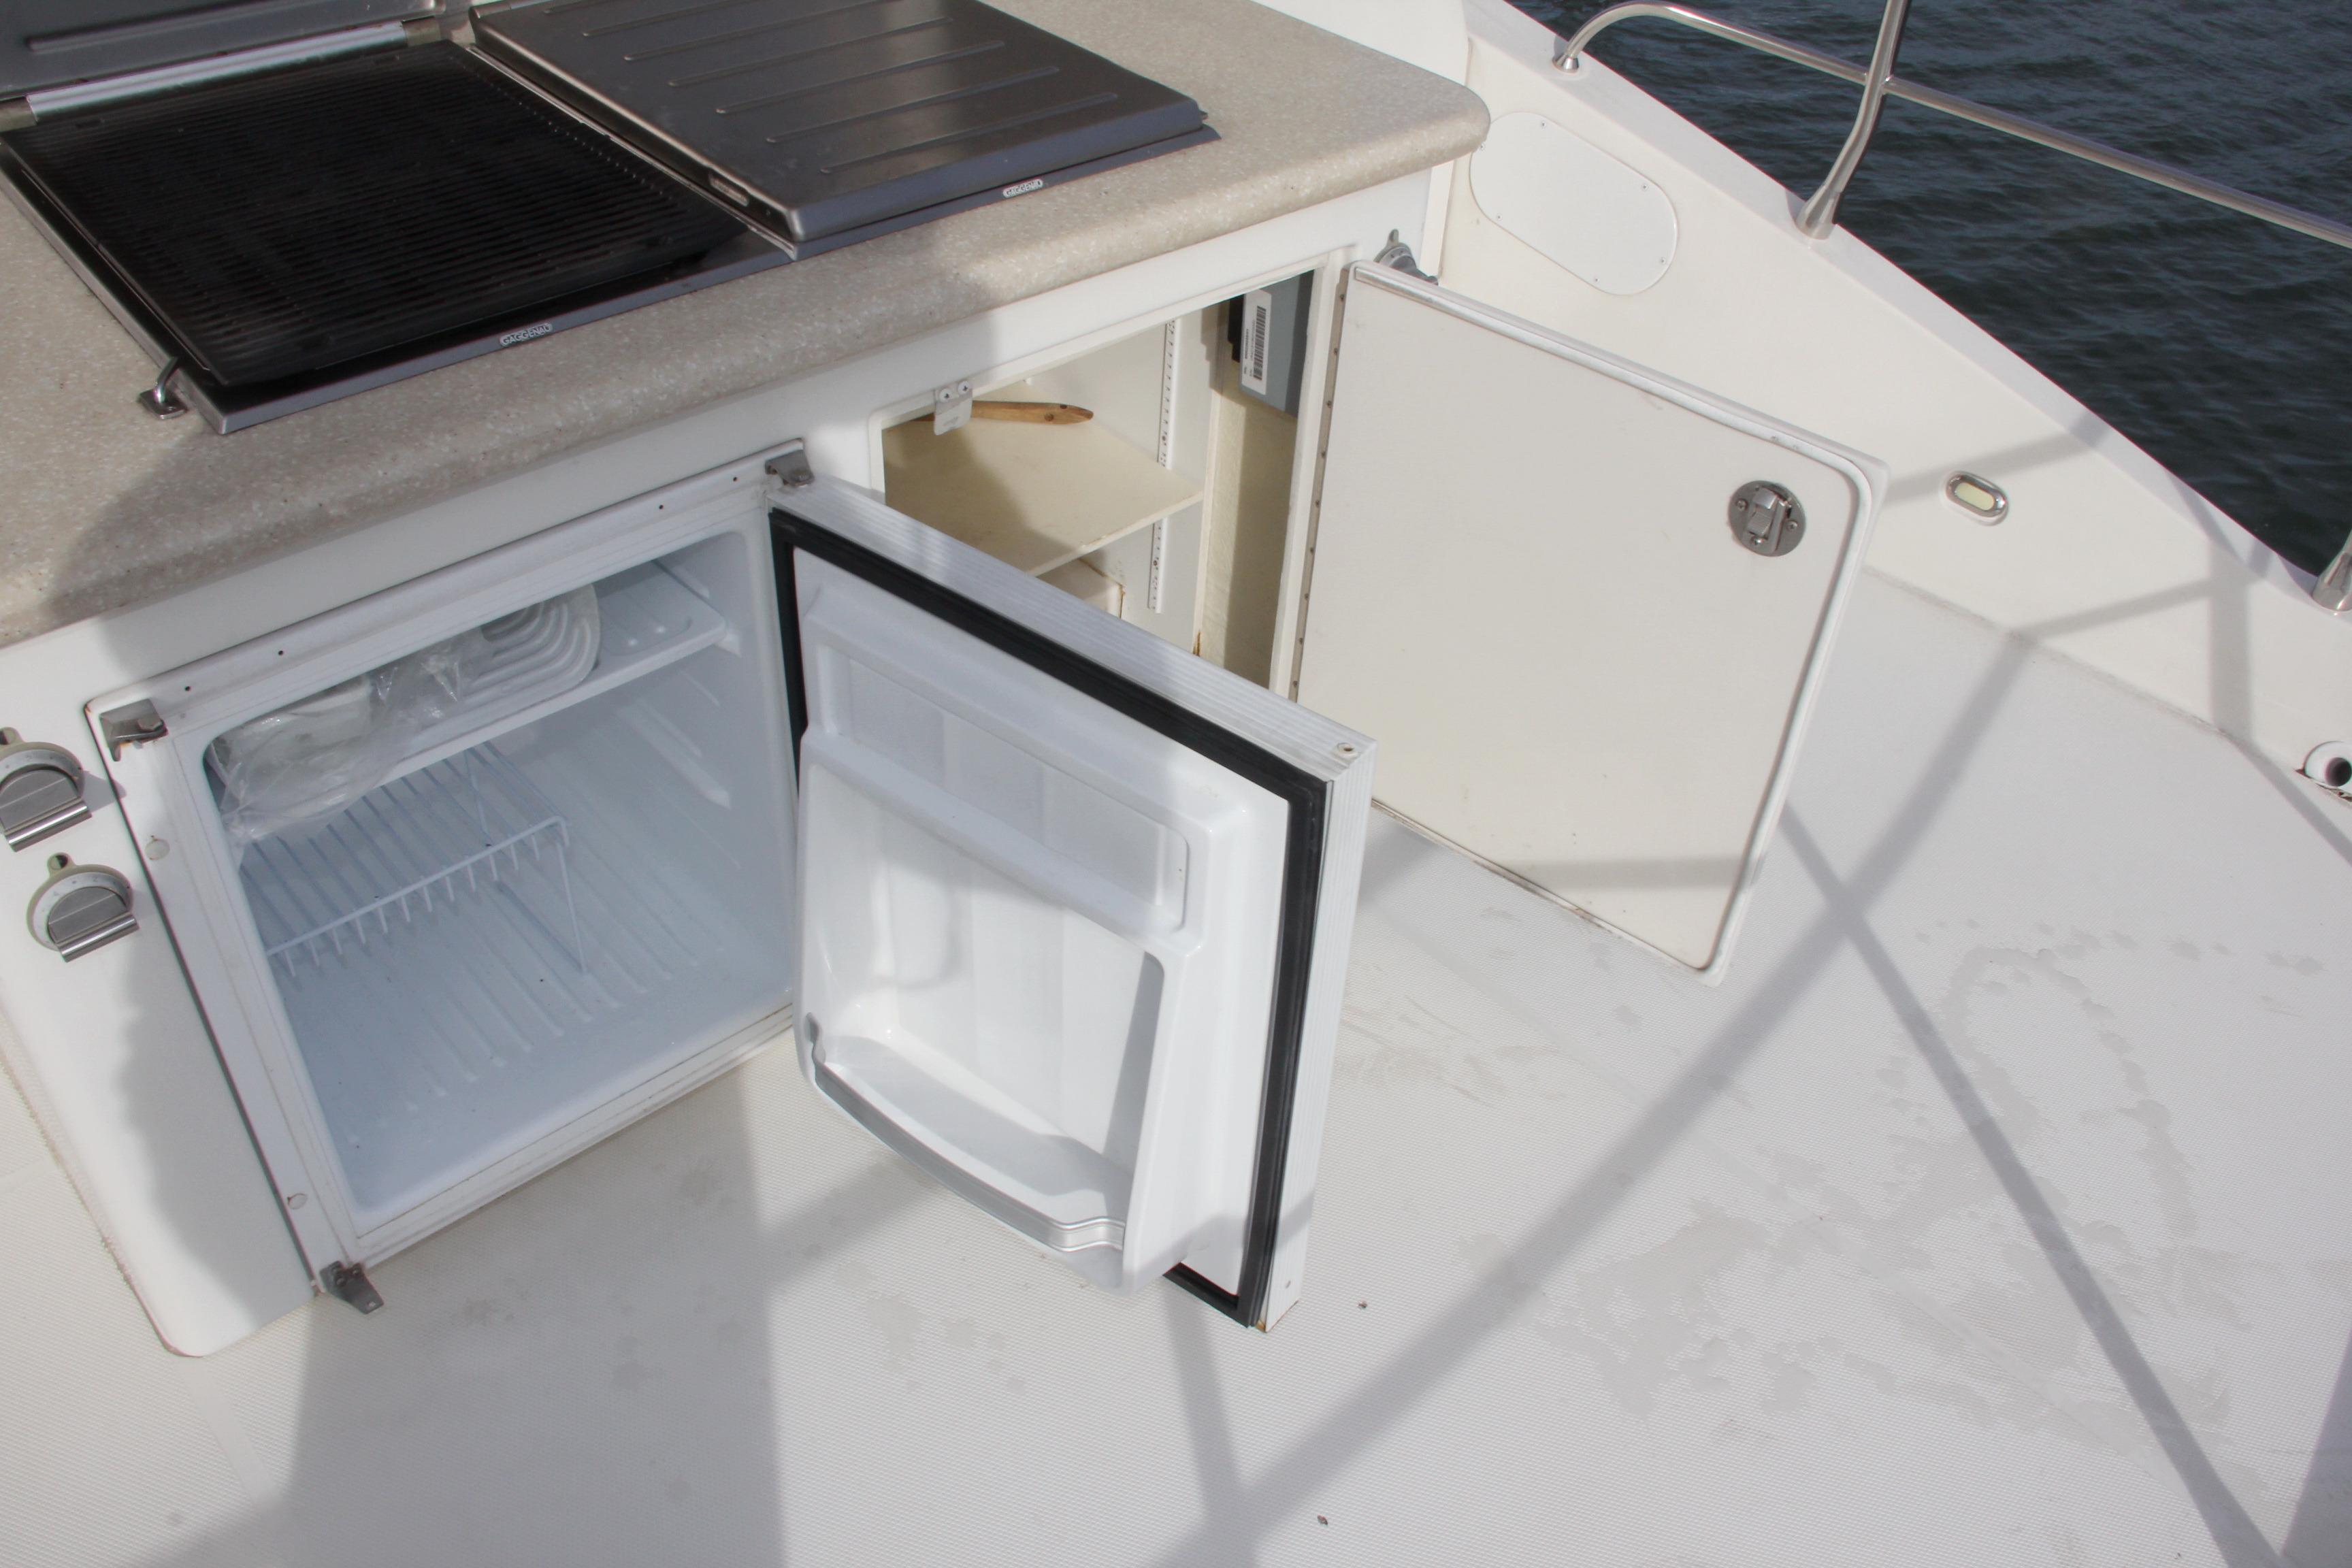 Refrigerator, Freezer and Storage